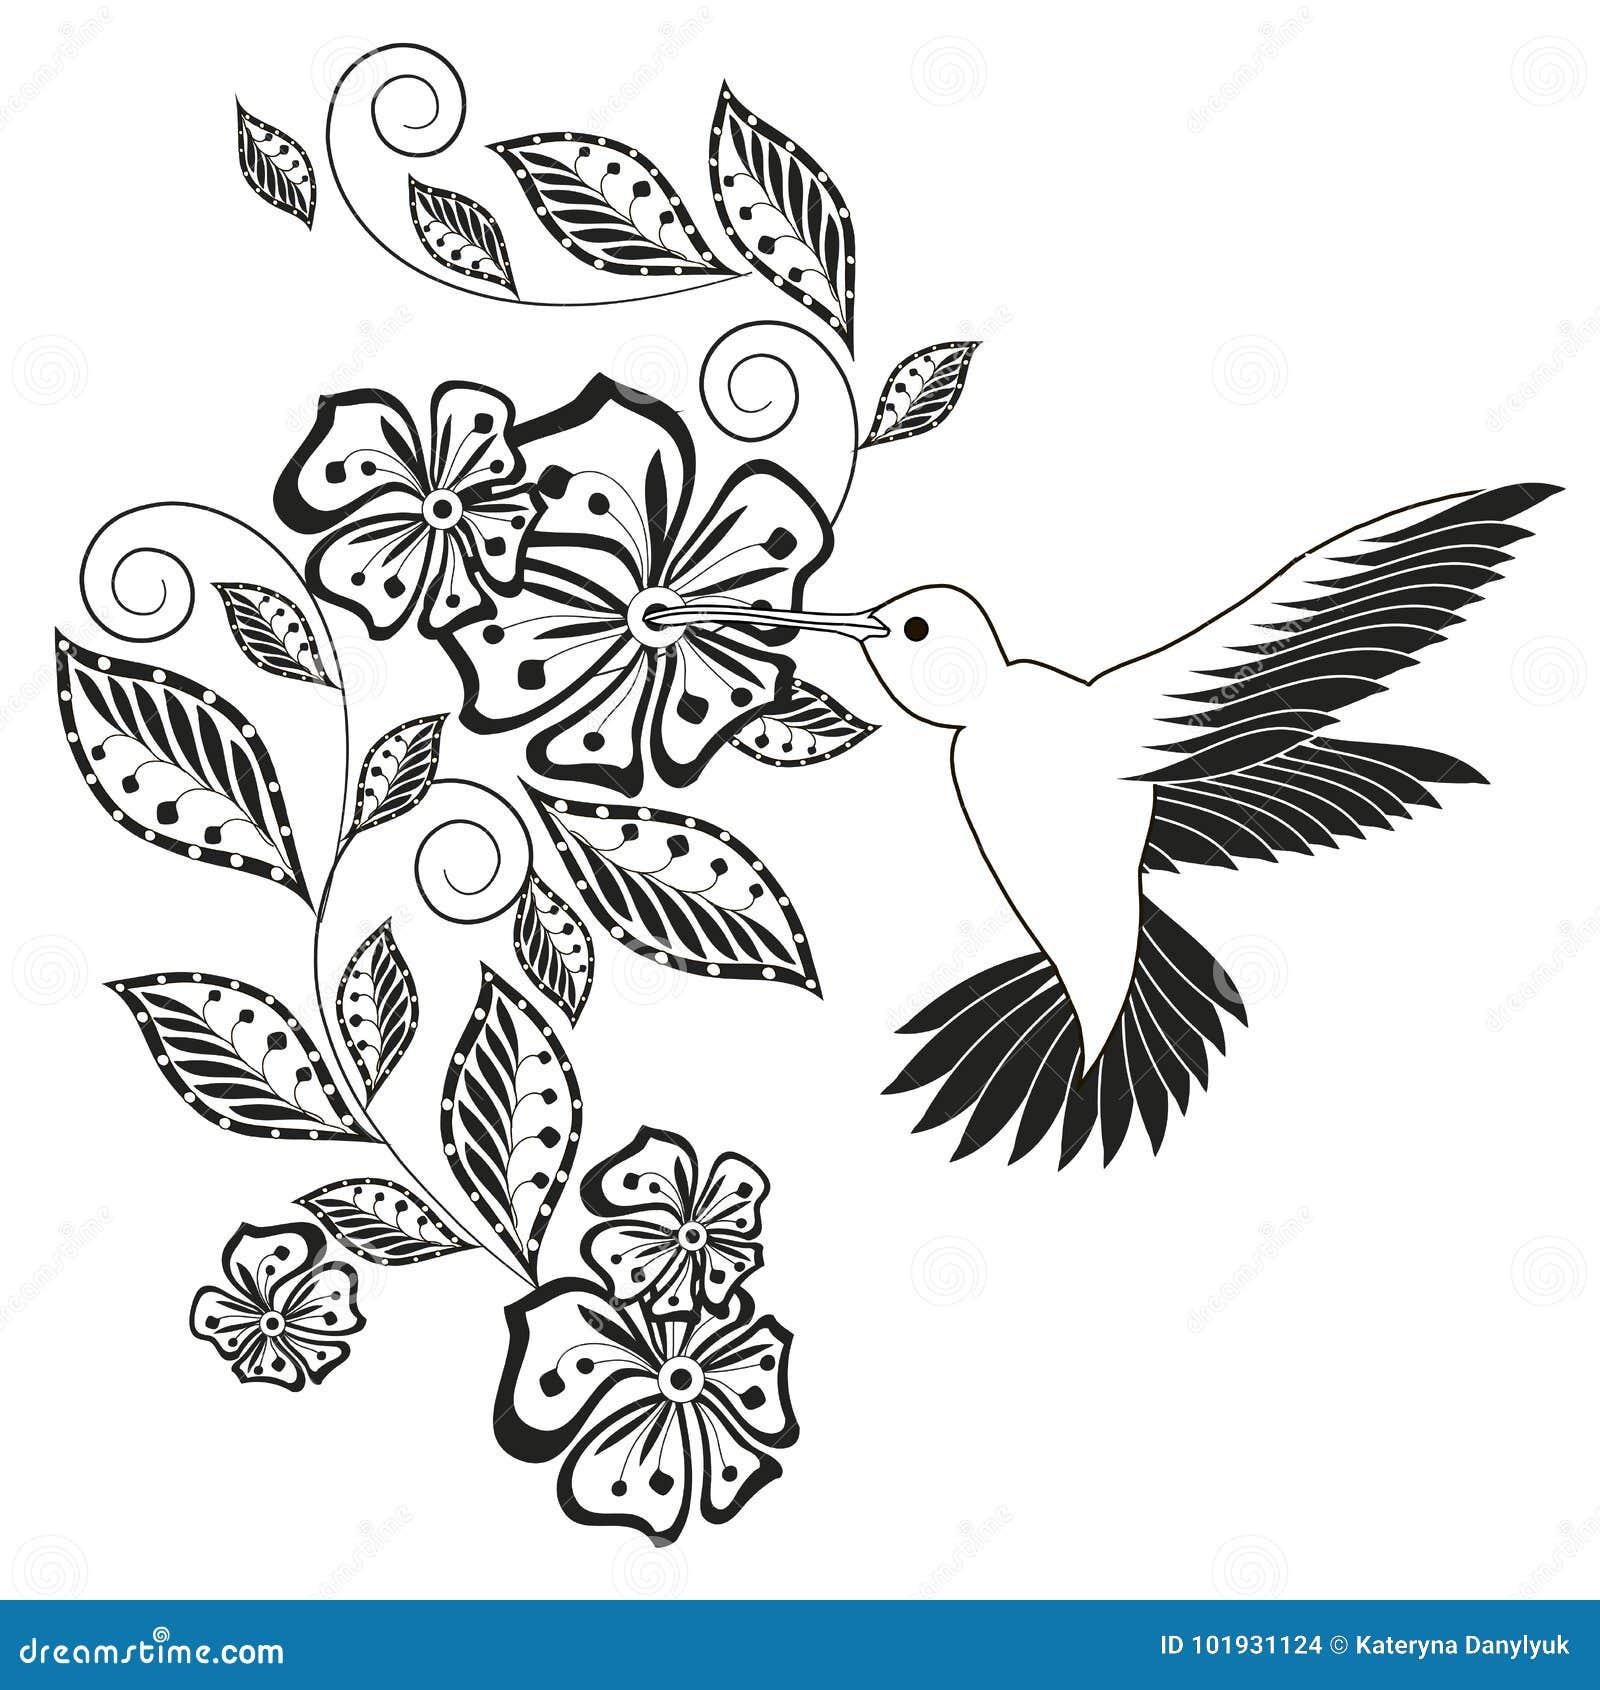 Monochrome Hand Drawn Decorative Floral Element Hummingbird For